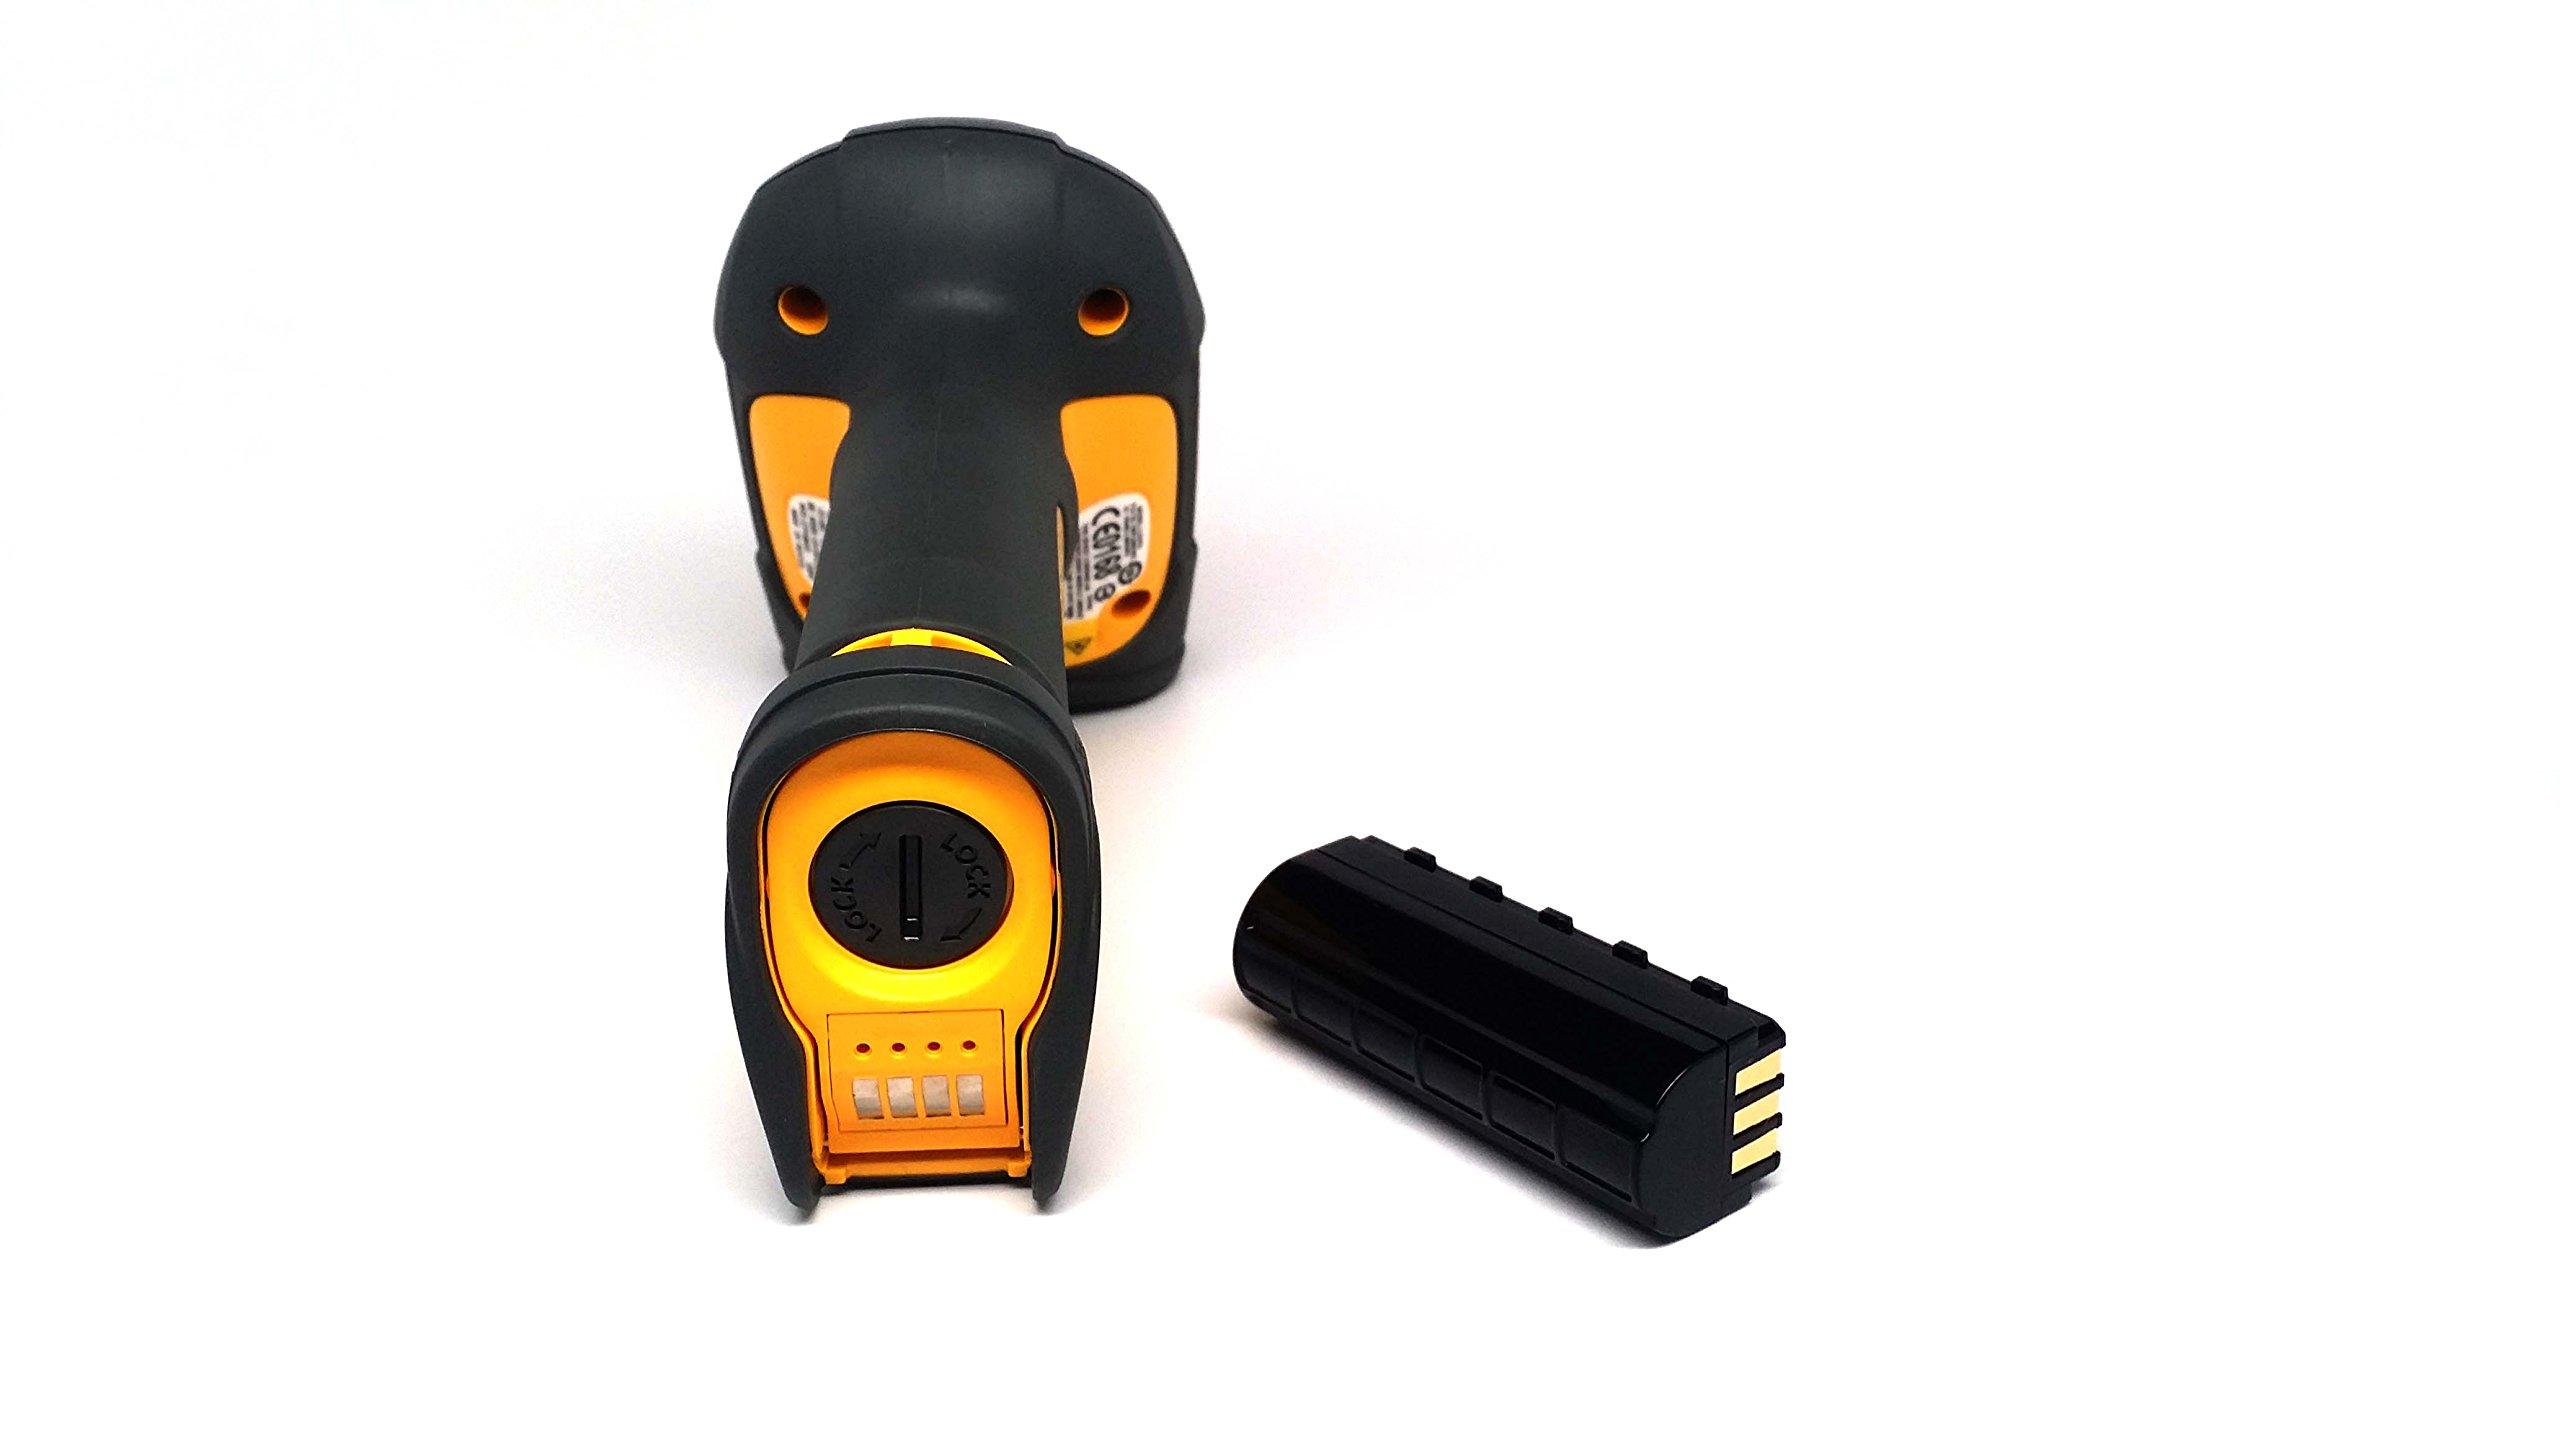 Zebra/Motorola Symbol LS3578-FZBU0100UR, Rugged, cordless scanner with integrated Bluetooth, Includes Cradle and USB Cord by Zebra/Motorola Symbol (Image #5)